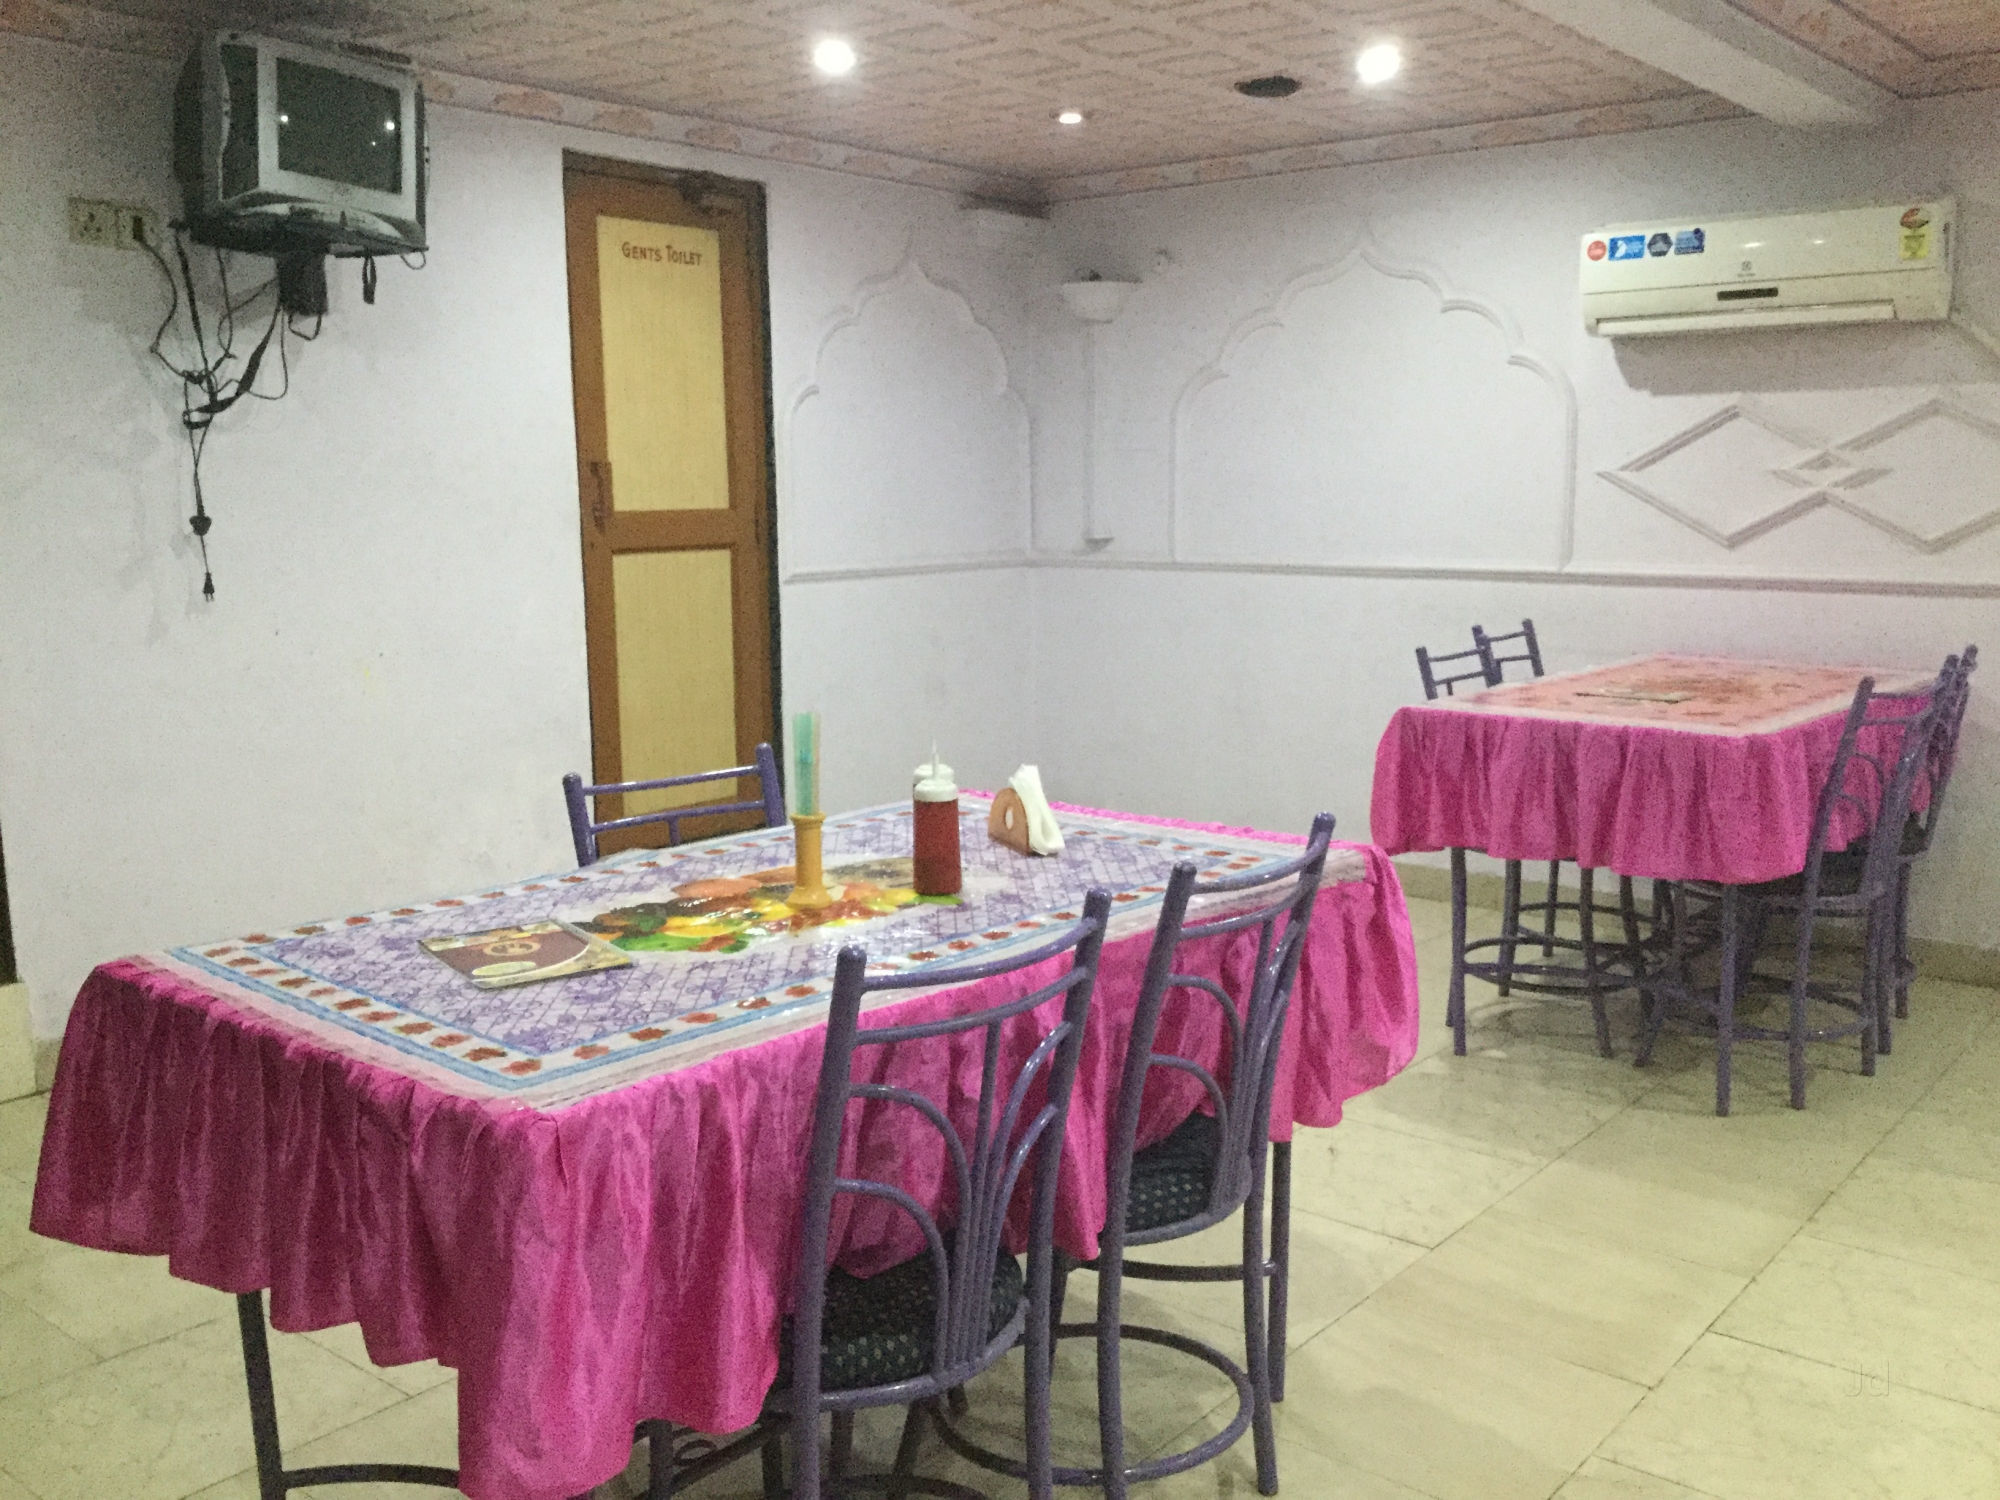 Kiran Restaurant - Aishbagh - Lucknow Image